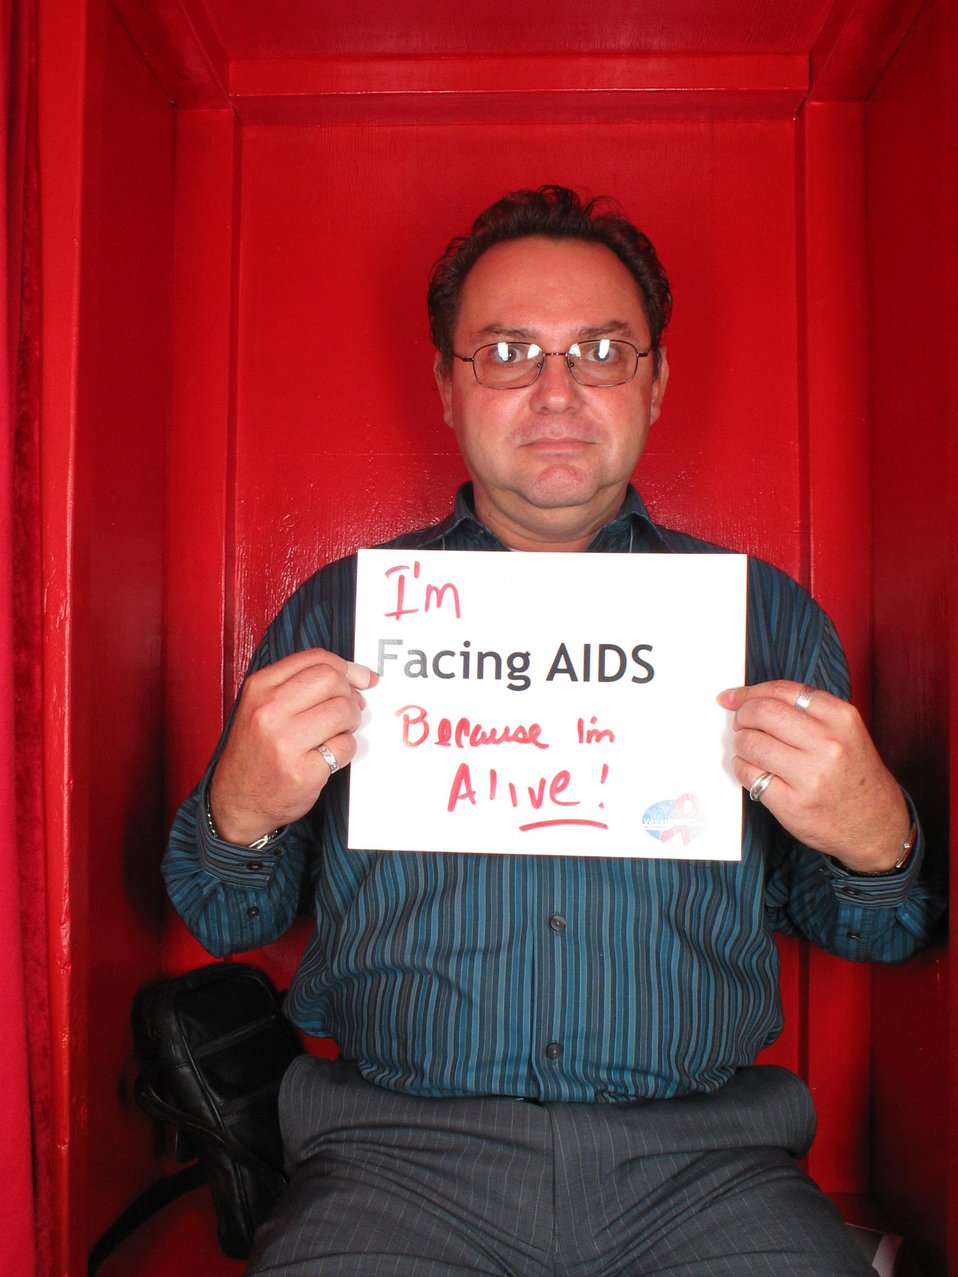 I'm Facing AIDS because I'm alive.